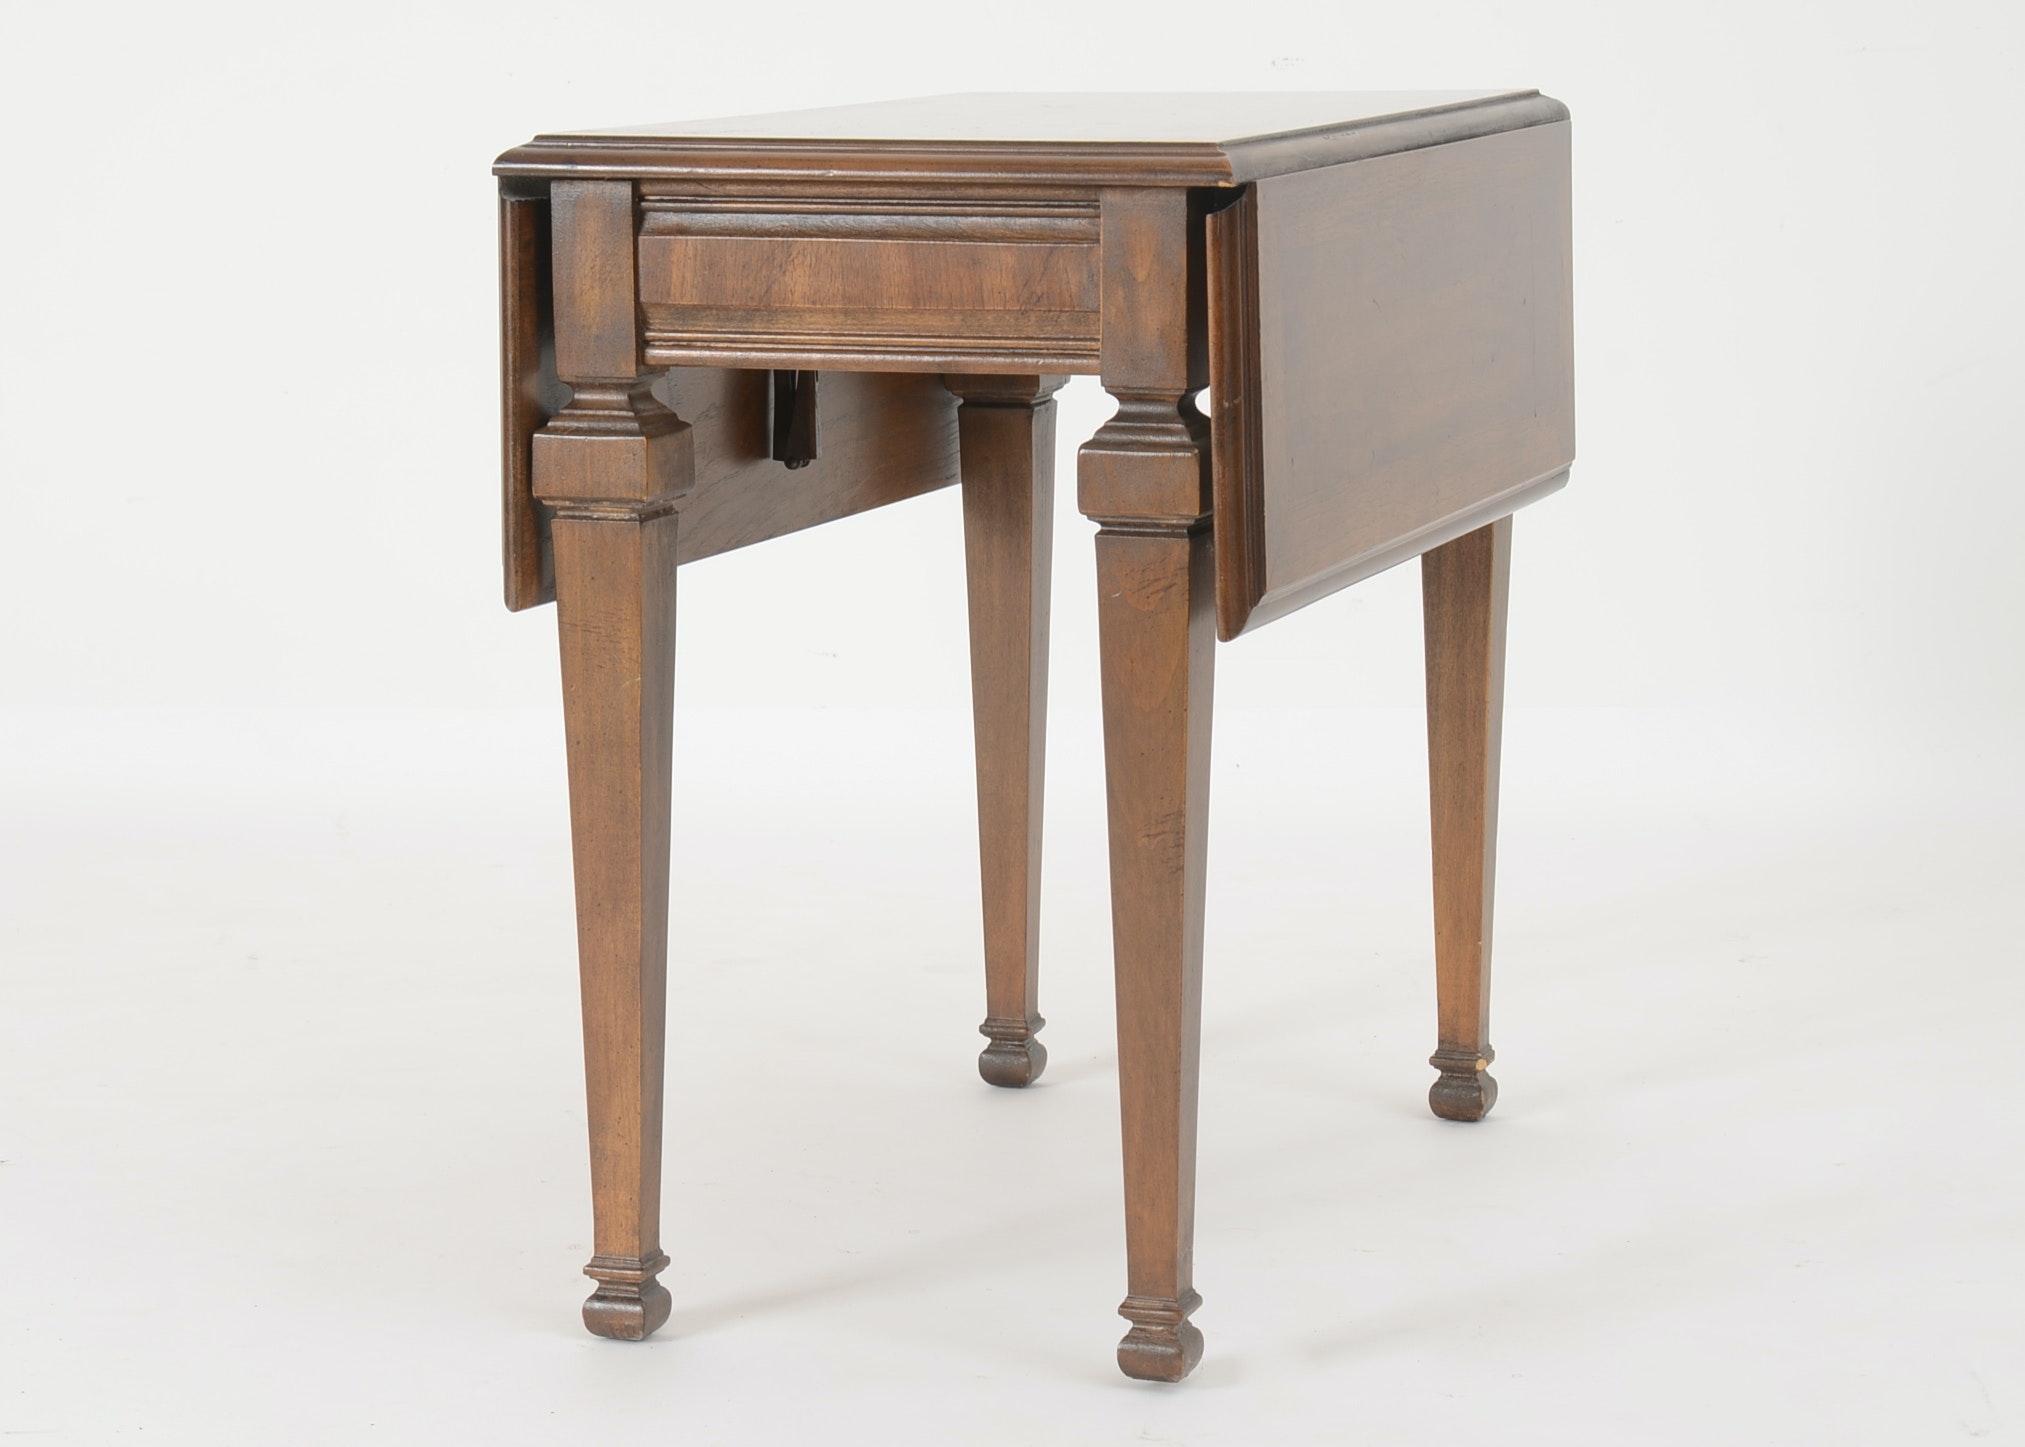 Vintage Drop Leaf Side Table By Lane Furniture Ebth